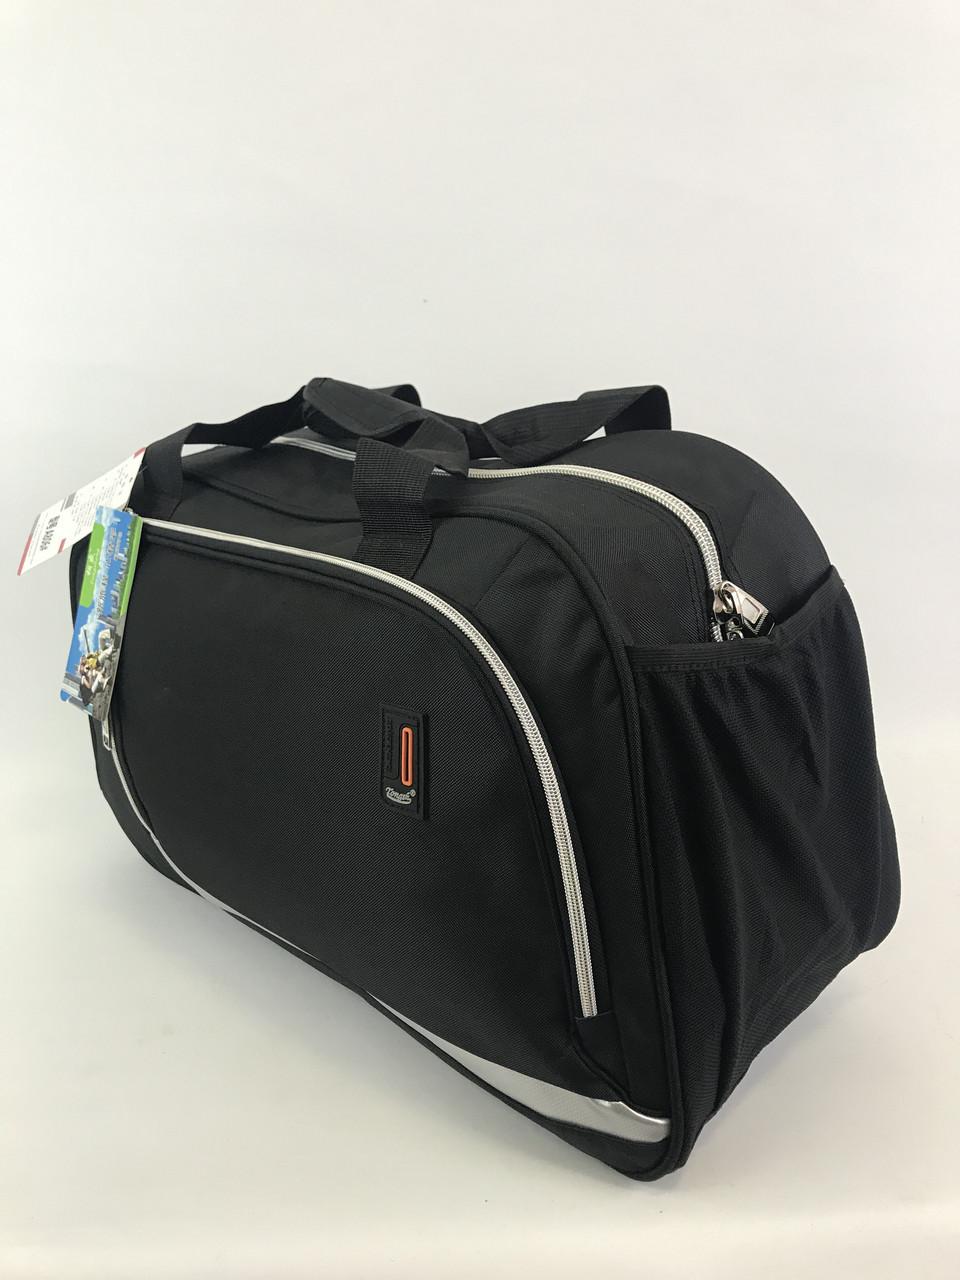 Дорожная удобная сумка YR A806 (55 см)